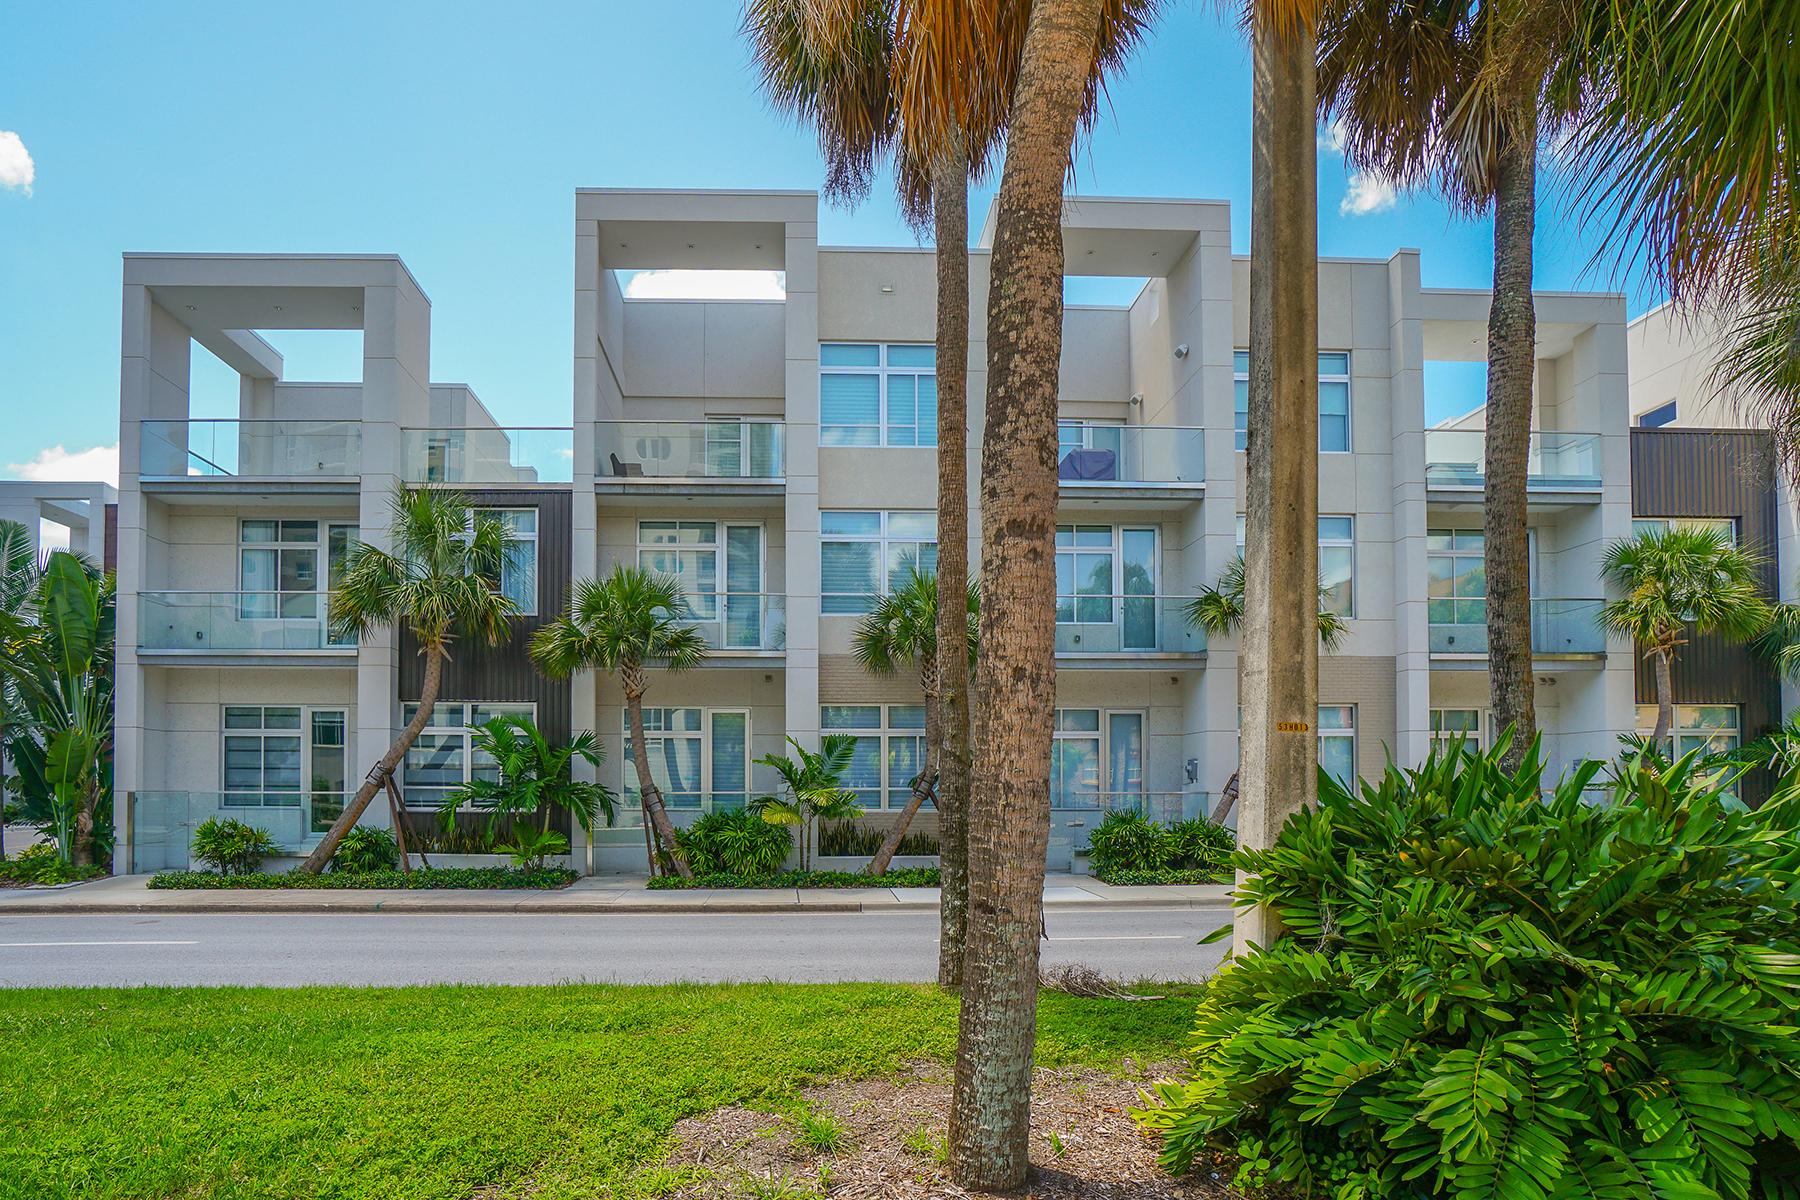 Immobilie zu verkaufen Sarasota